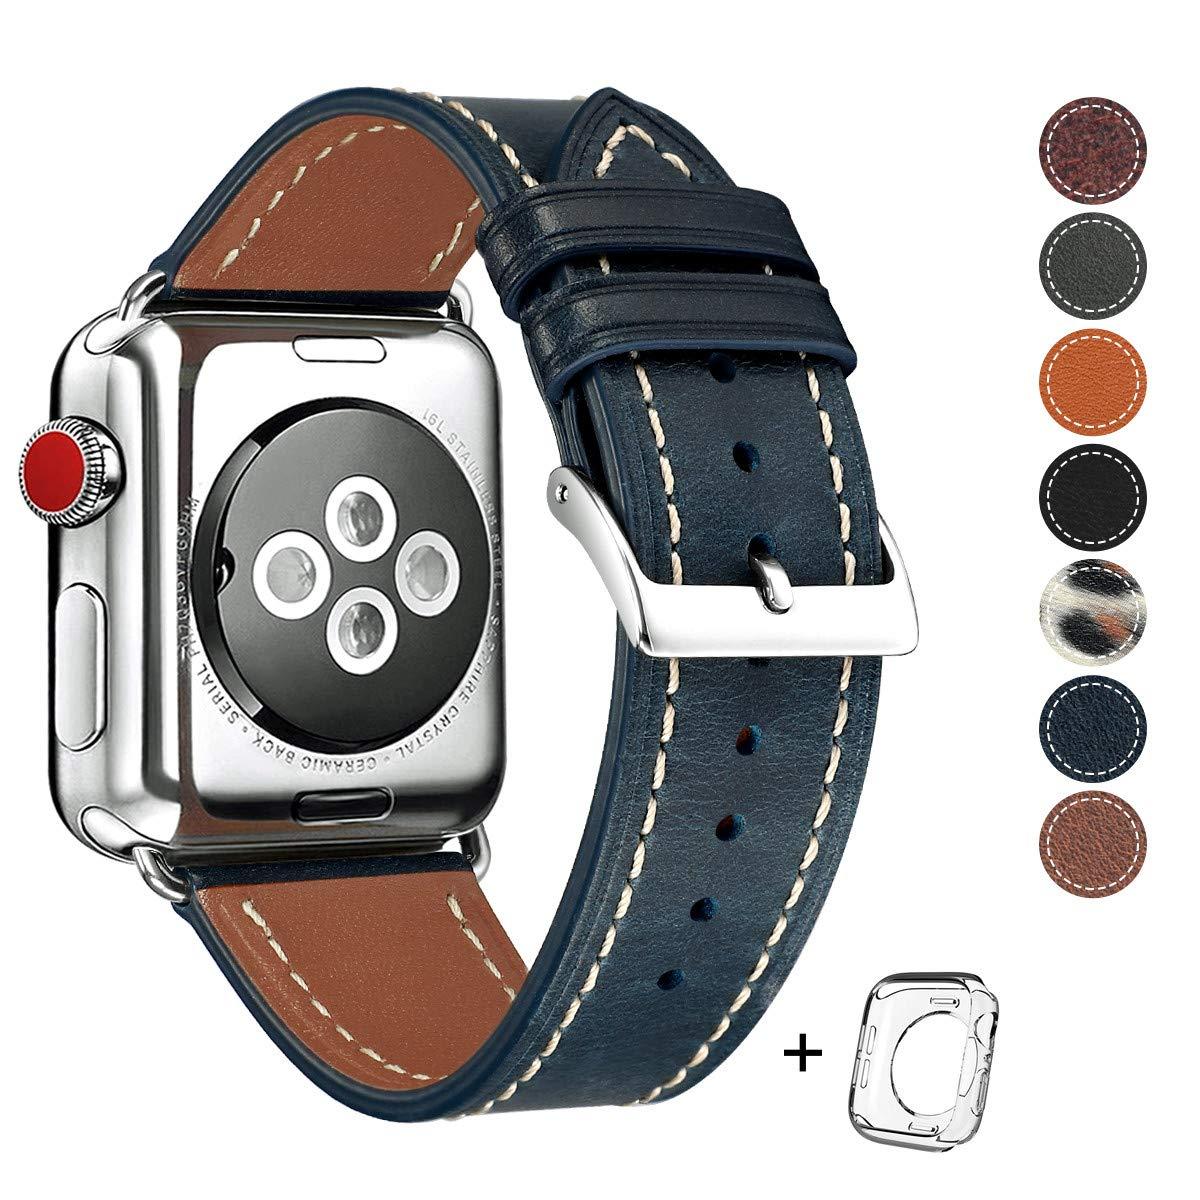 Malla Cuero para Apple Watch (42/44mm) HOT [7M8PNL41]